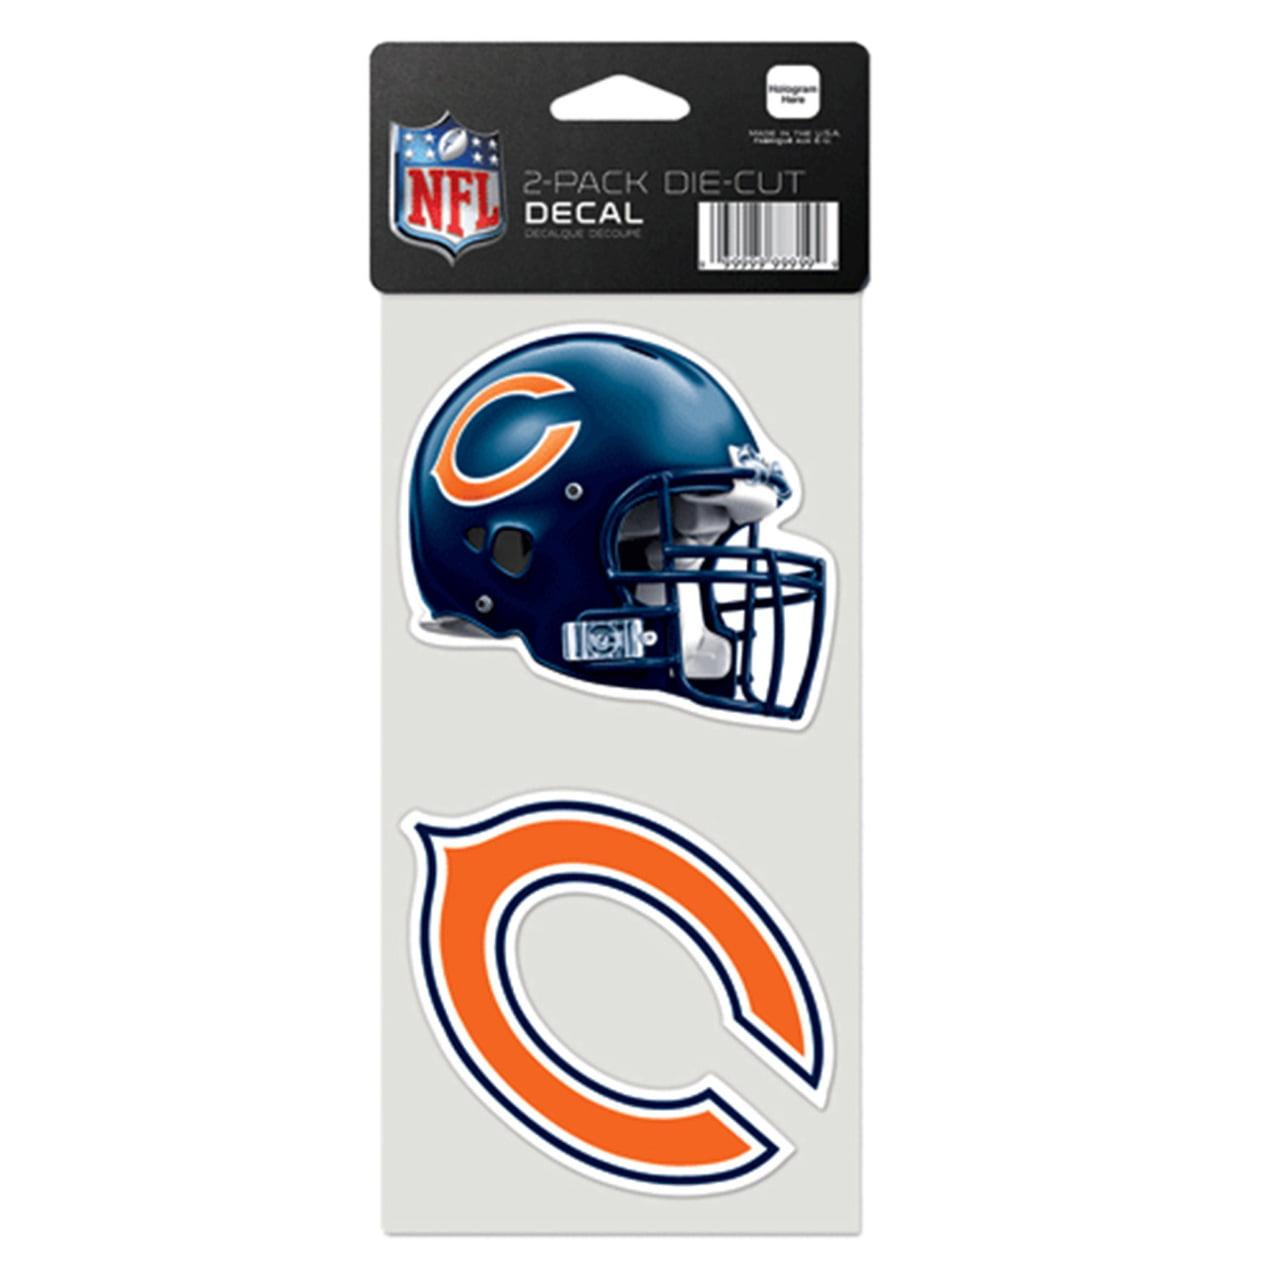 Chicago Bears 4x4 Die Cut Decal Set - Team Color